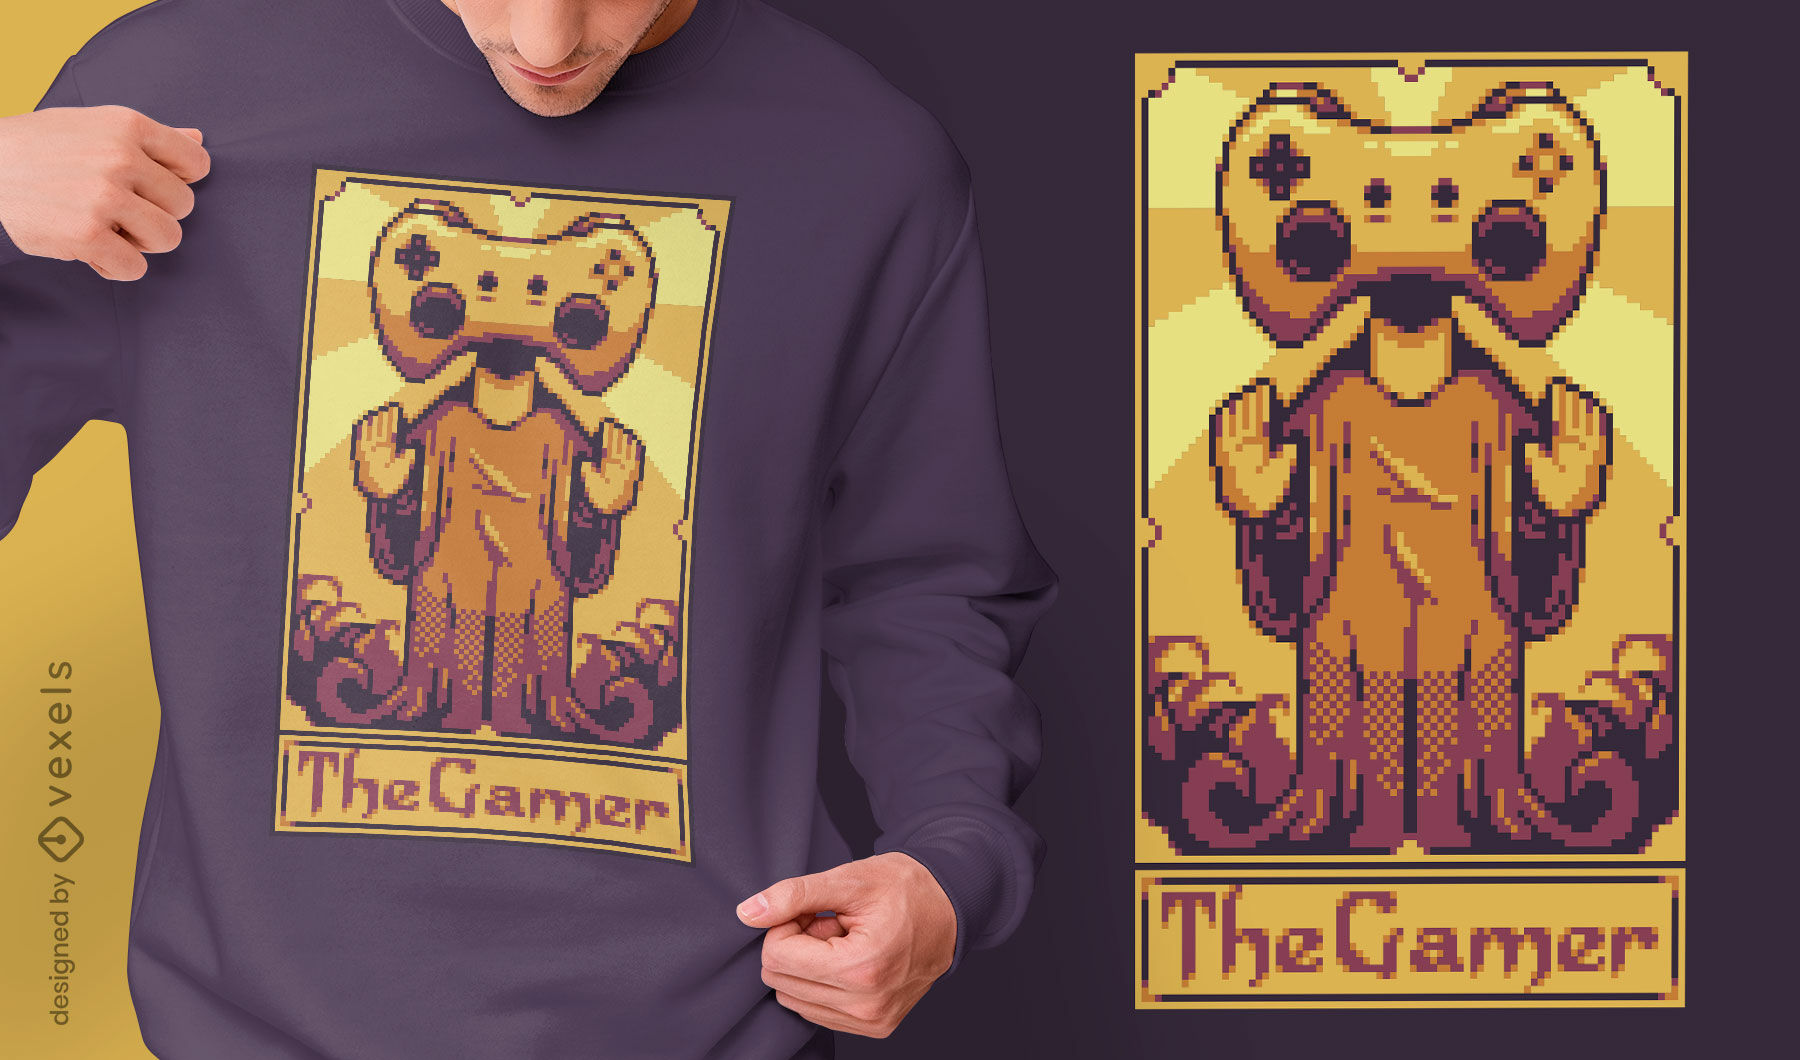 Pixel tarot card joystick gamer t-shirt design